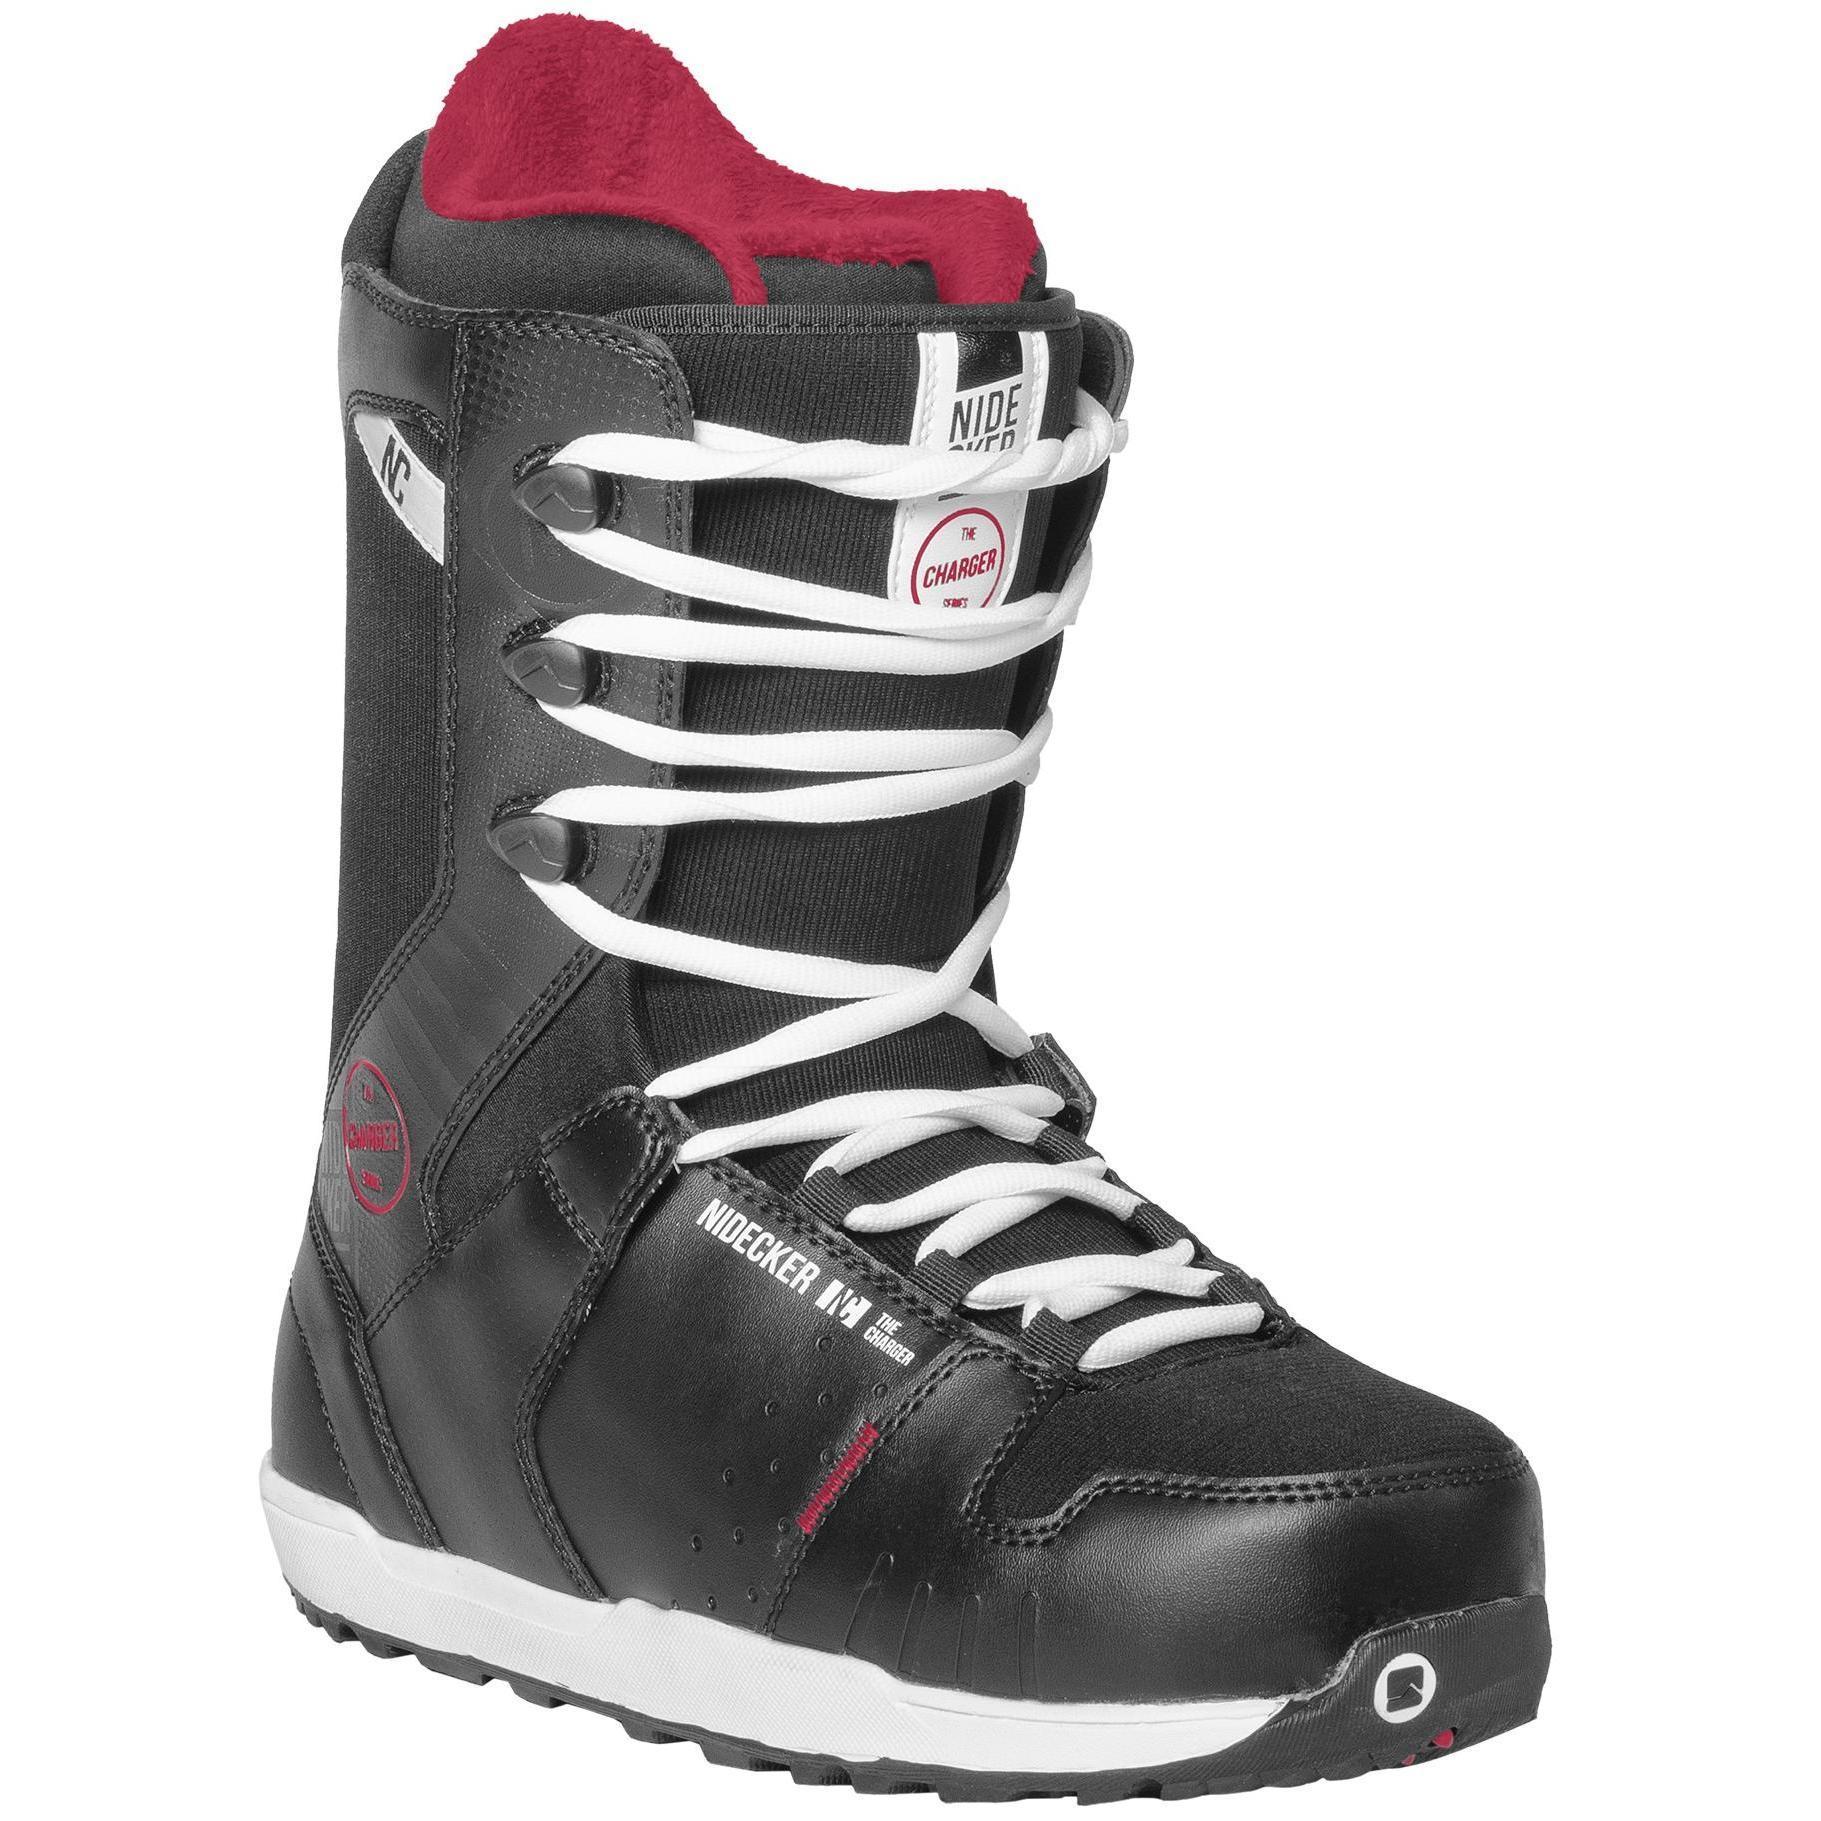 Ботинки для сноуборда NIDECKER 2015-16 CHARGER LACE - купить ... 4bee5b69060